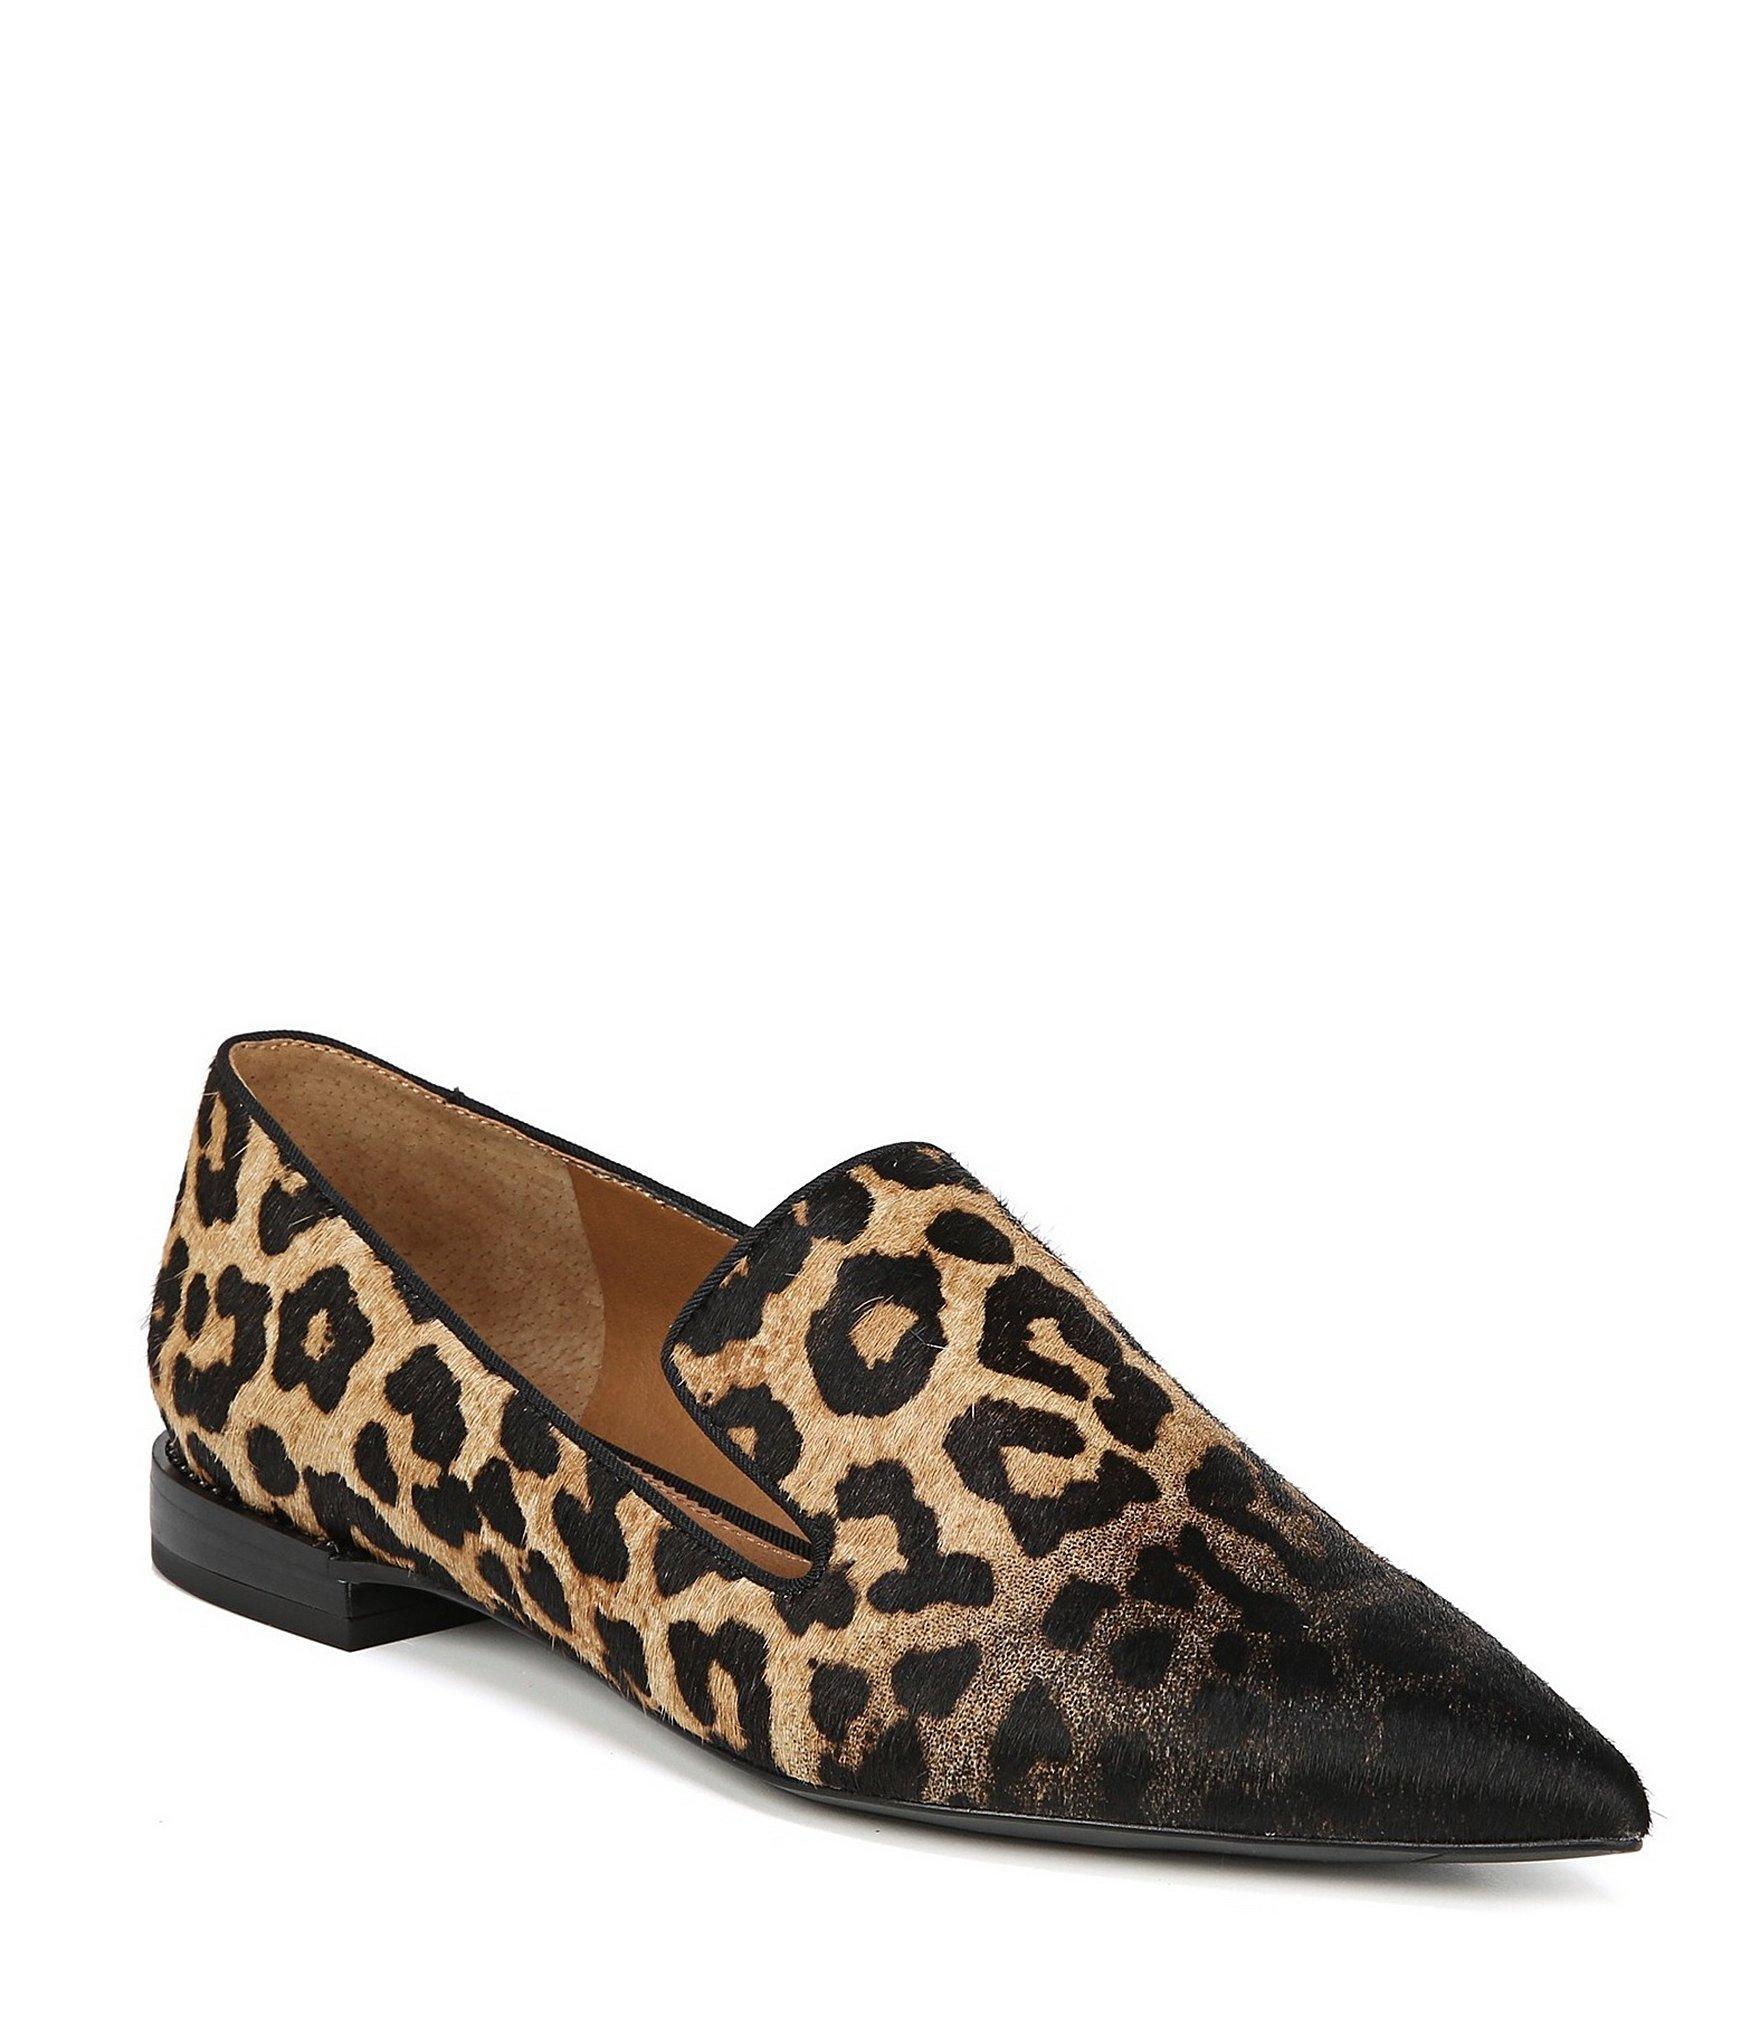 b328741b4a2 Franco Sarto. Women s Sarto By Topaz 2 Leopard Print Calf Hair Loafers